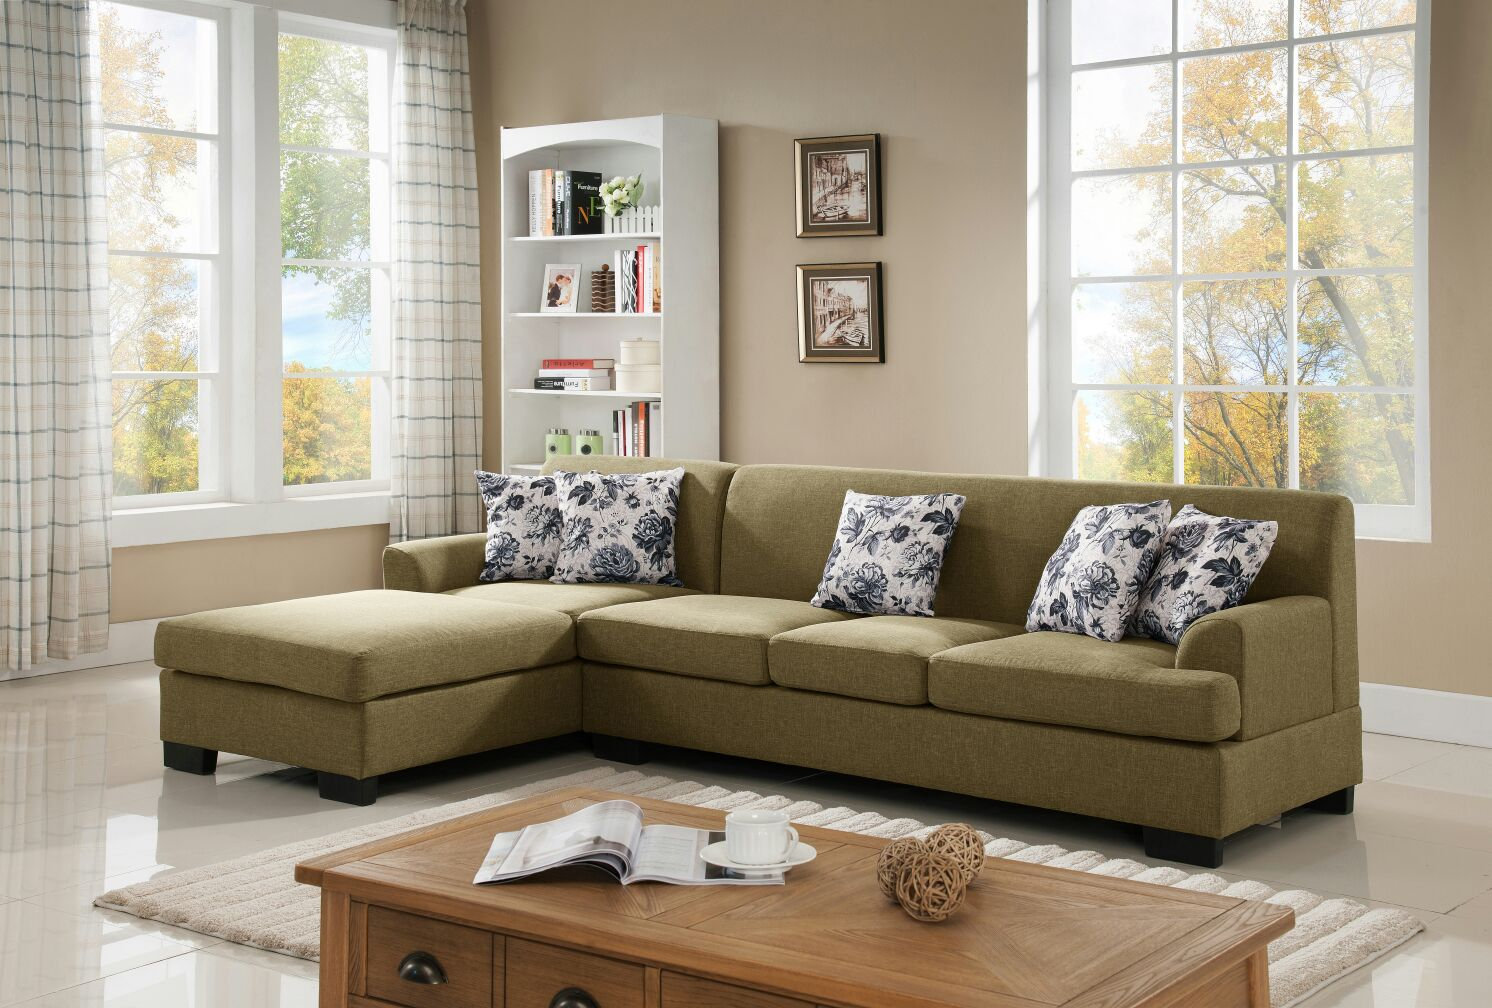 Astonishing Diana Sectional Sofa Corner Lounge Beatyapartments Chair Design Images Beatyapartmentscom